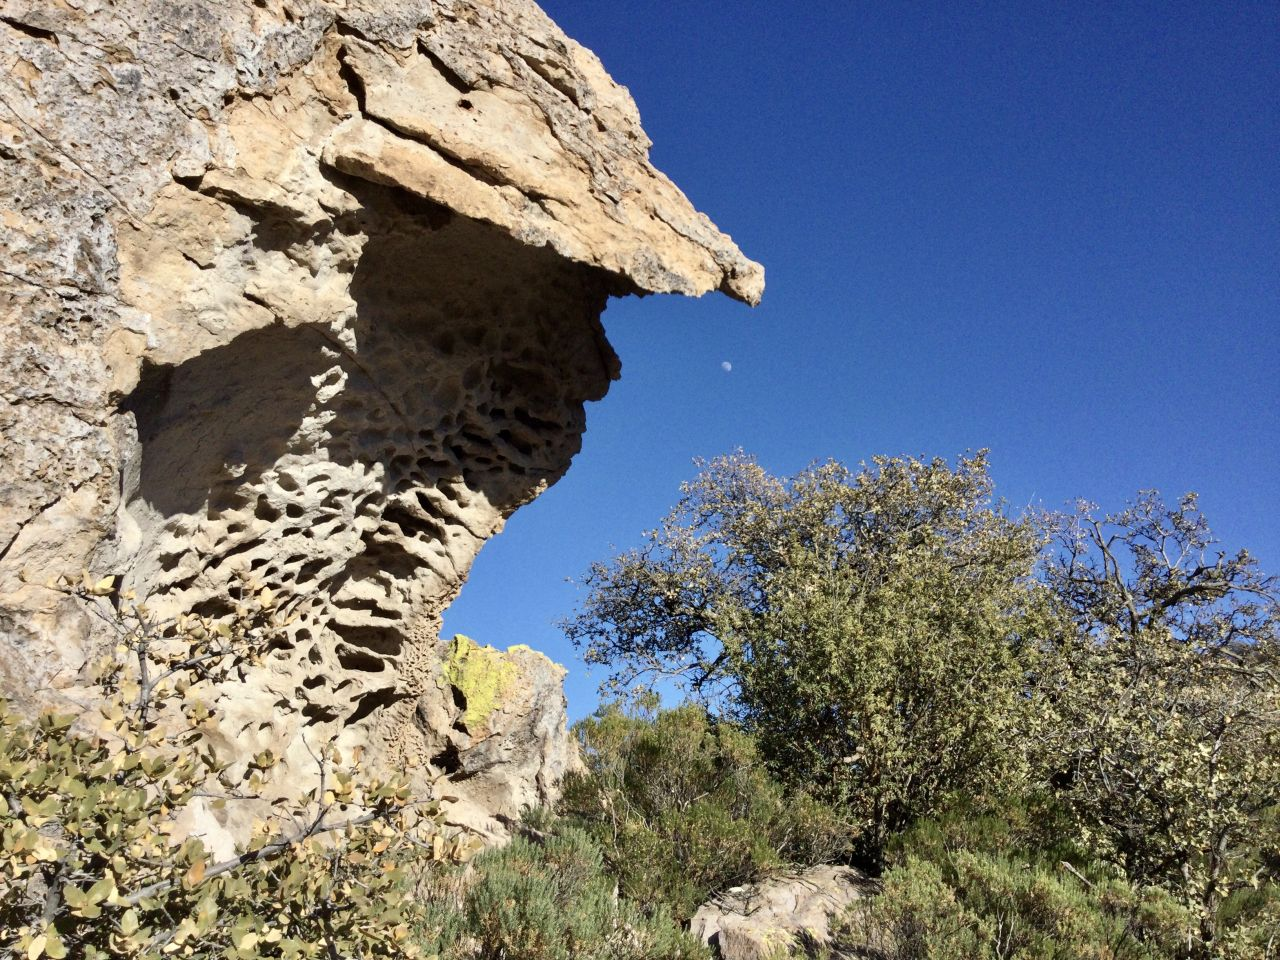 deeply veined rock